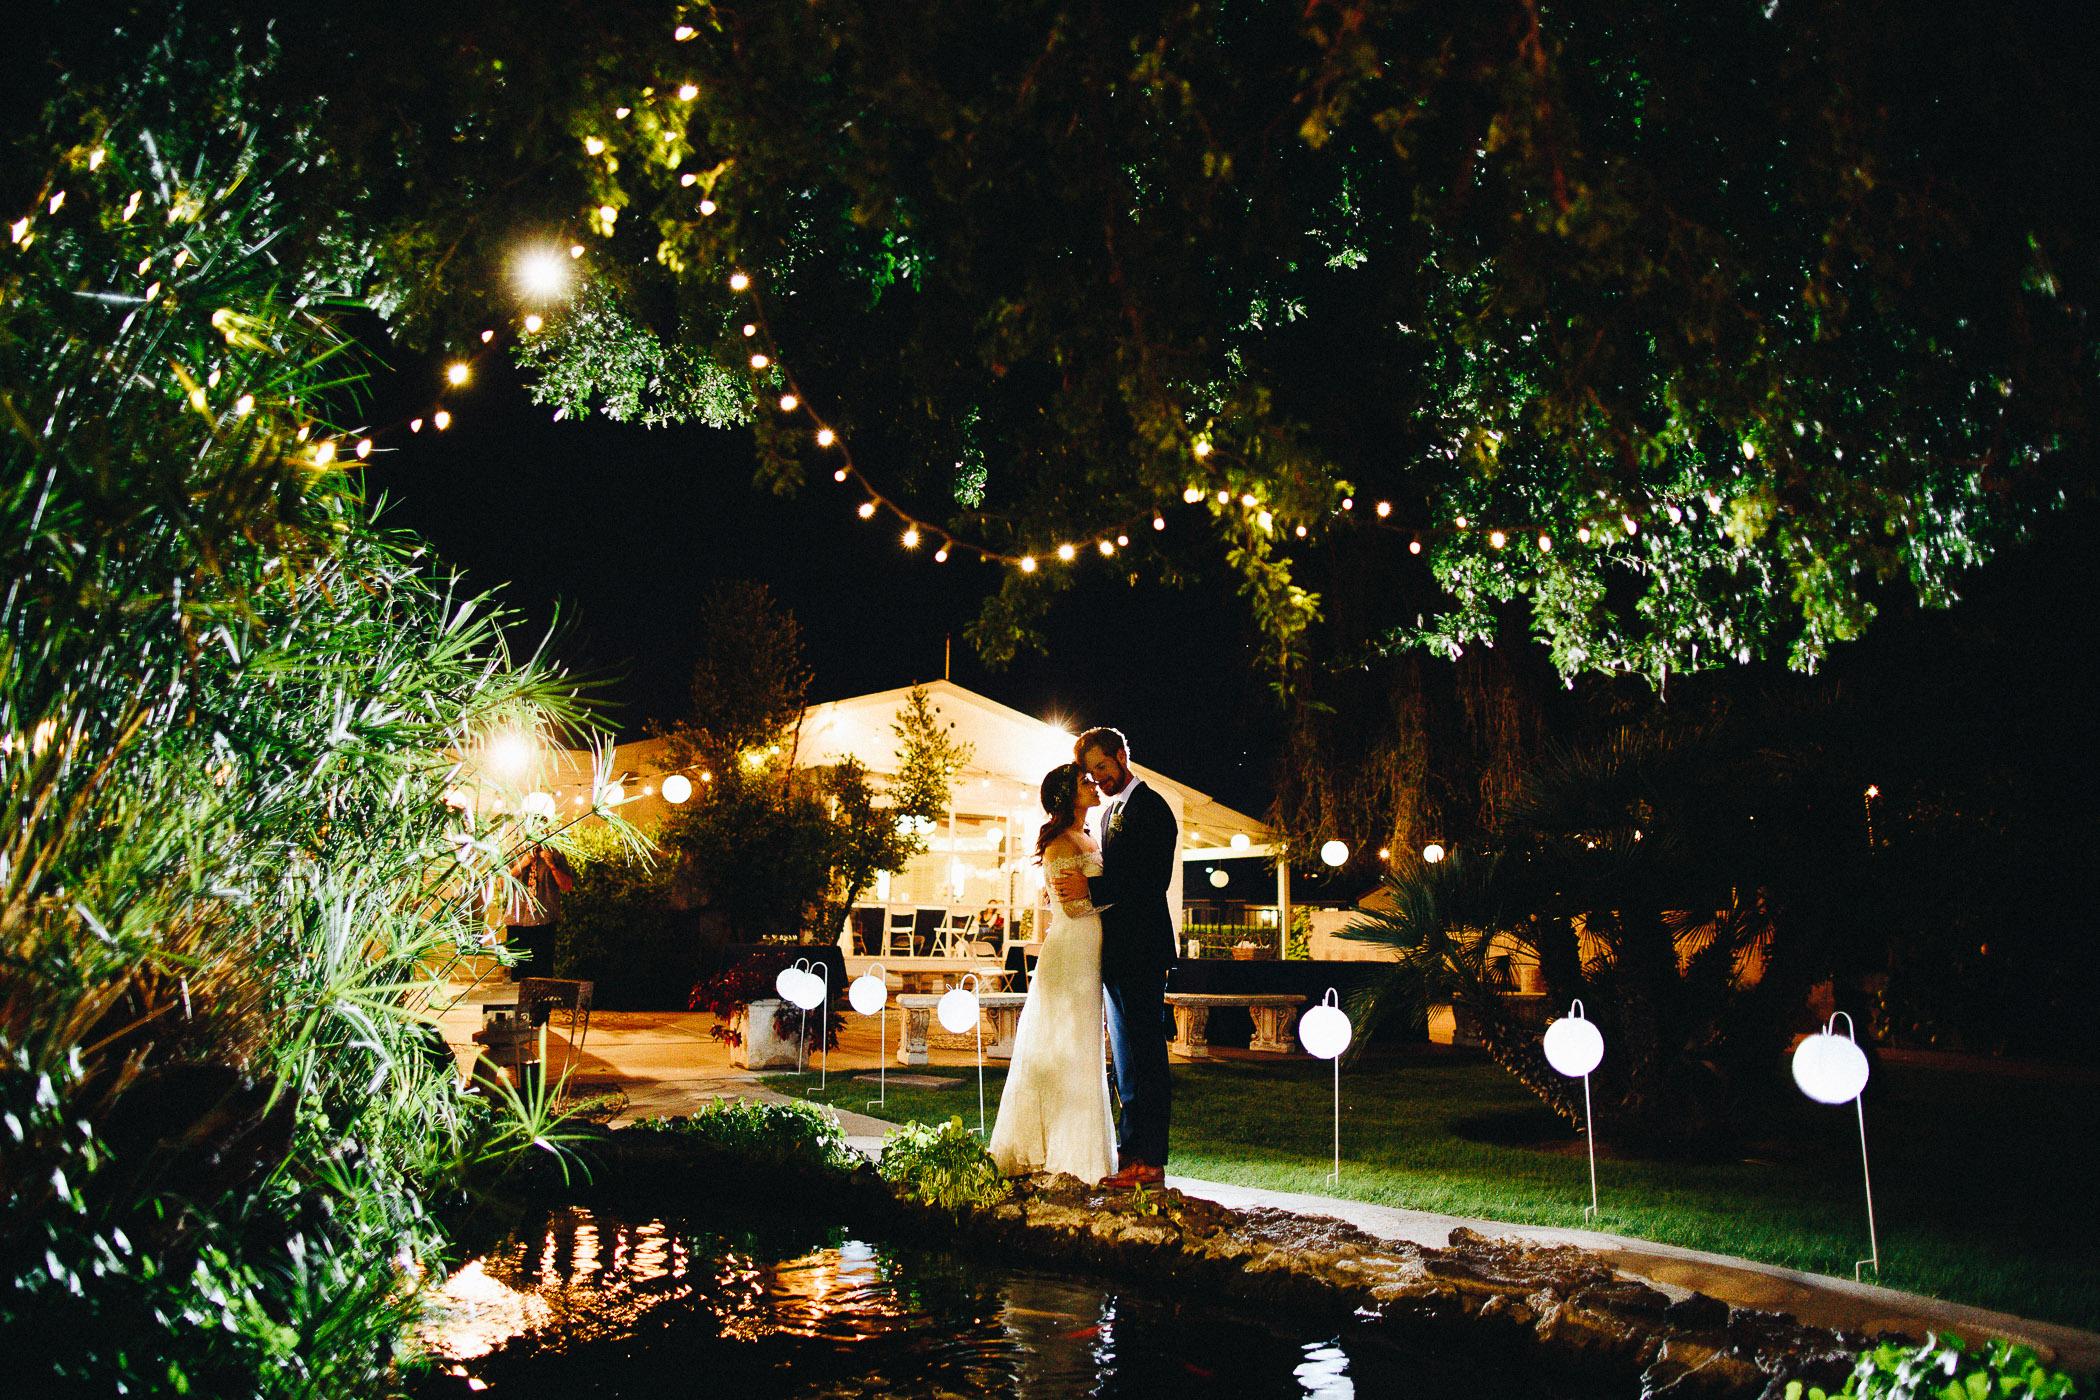 181104-Luxium-Weddings-Arizona-@matt__Le-Brandon-Kariana-Phoenix-Valley-Garden-Center-1150.jpg